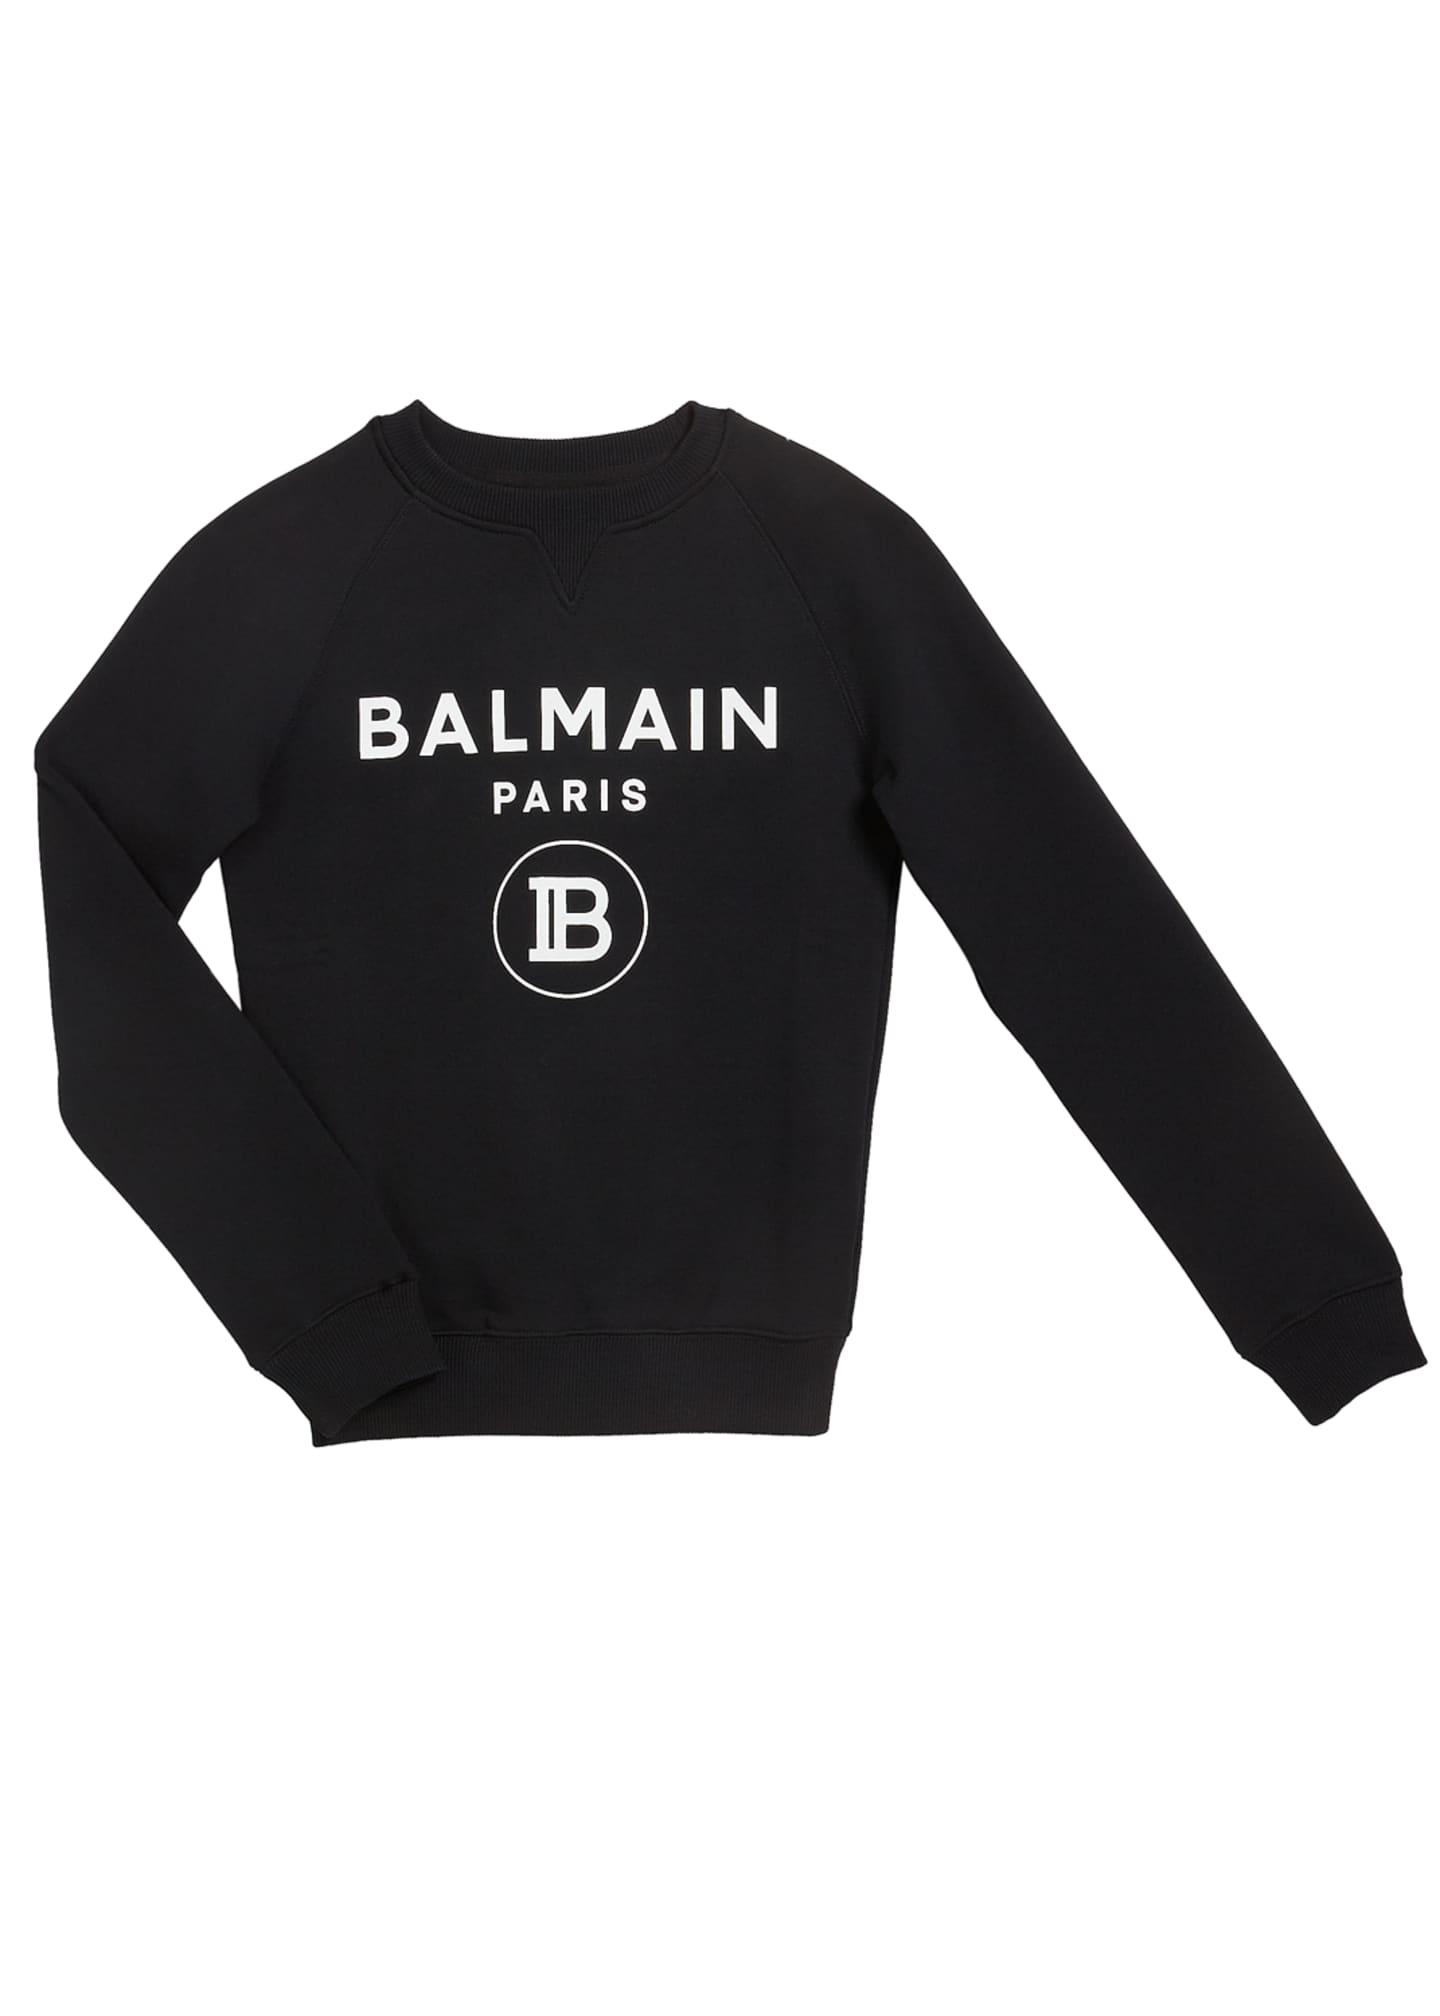 Balmain Kid's Pullover Logo Sweatshirt, Size 4-10